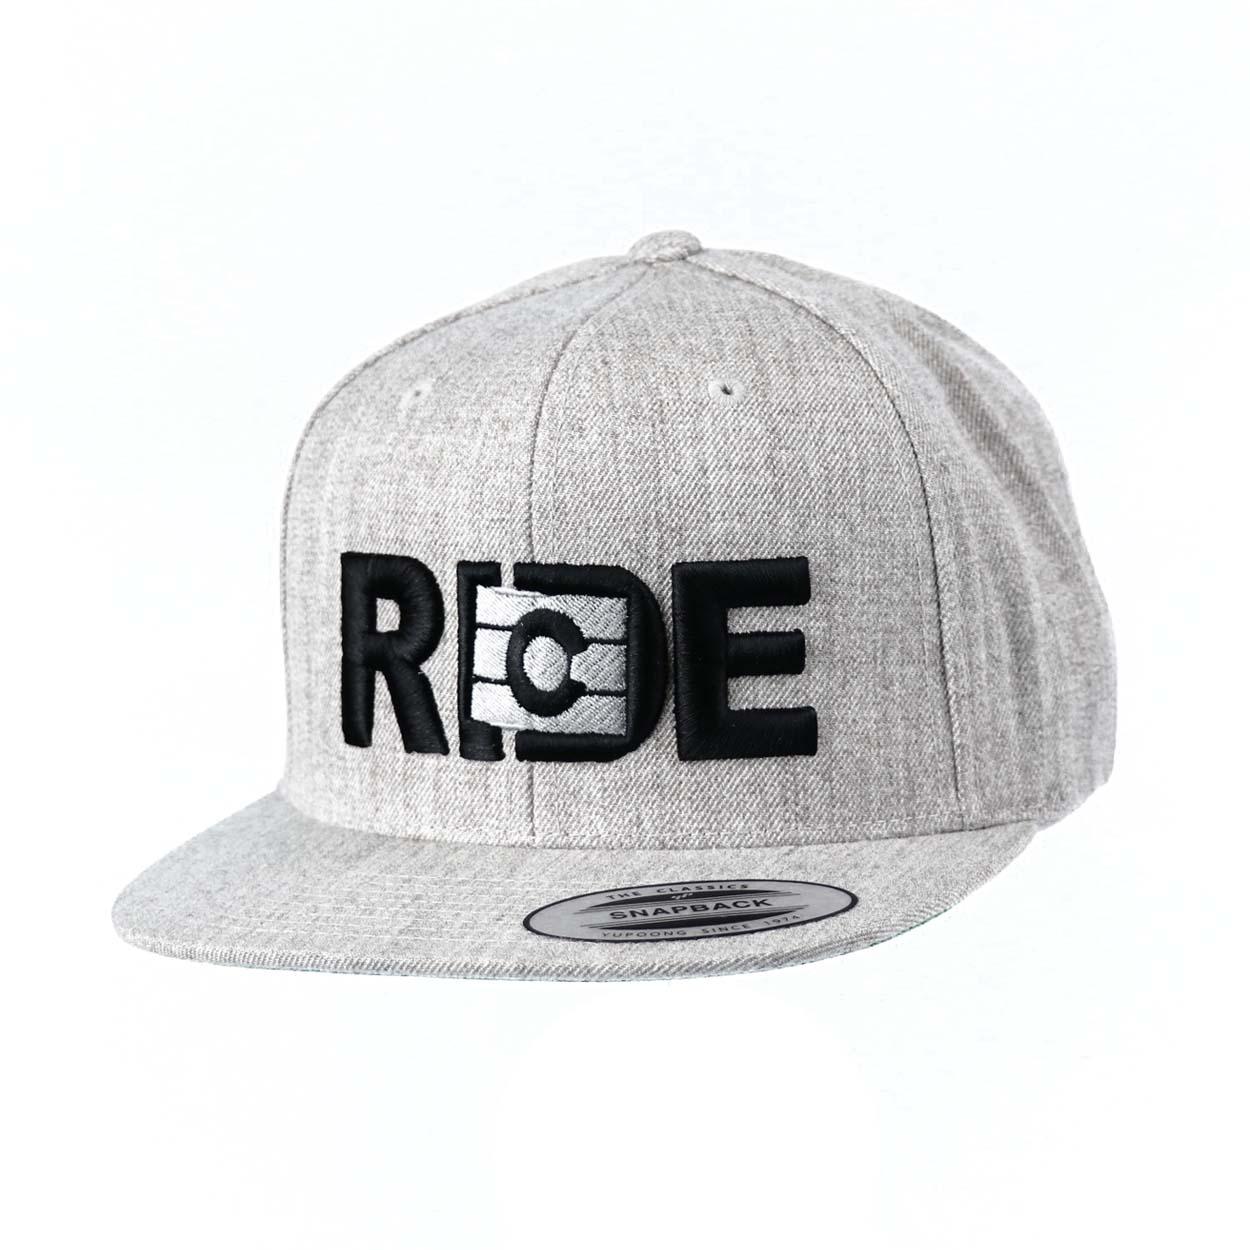 Ride Colorado Classic Embroidered  Snapback Flat Brim Hat Gray/Black